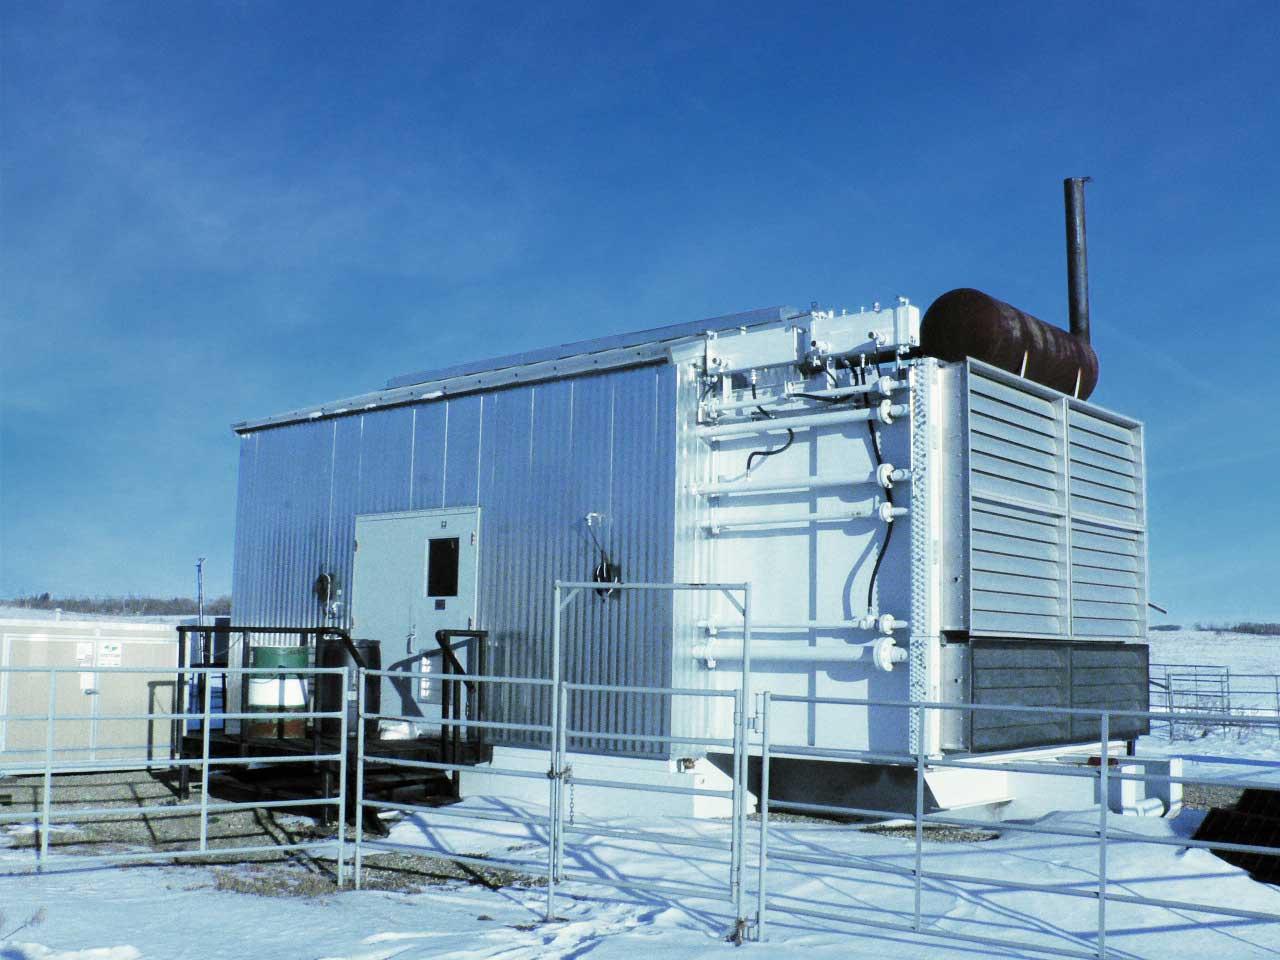 Used 425HP CAT Screw Compressor for sale in Alberta